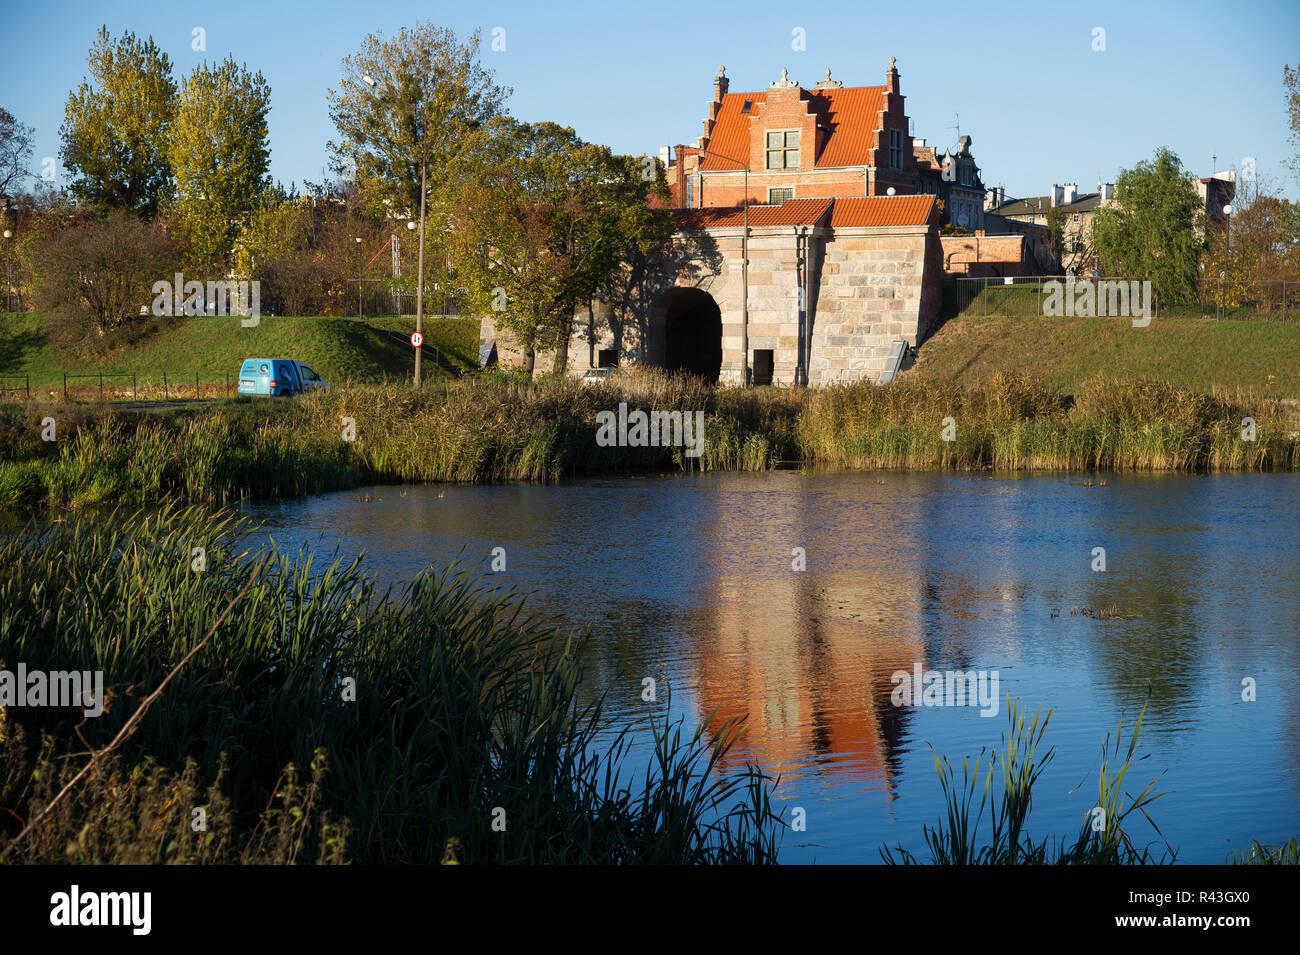 Renaissance Brama Nizinna (Lowland Gate) built by Jan Strakowski in XVII century is a part of early modern era fortifications of Gdansk, in Lower City - Stock Image